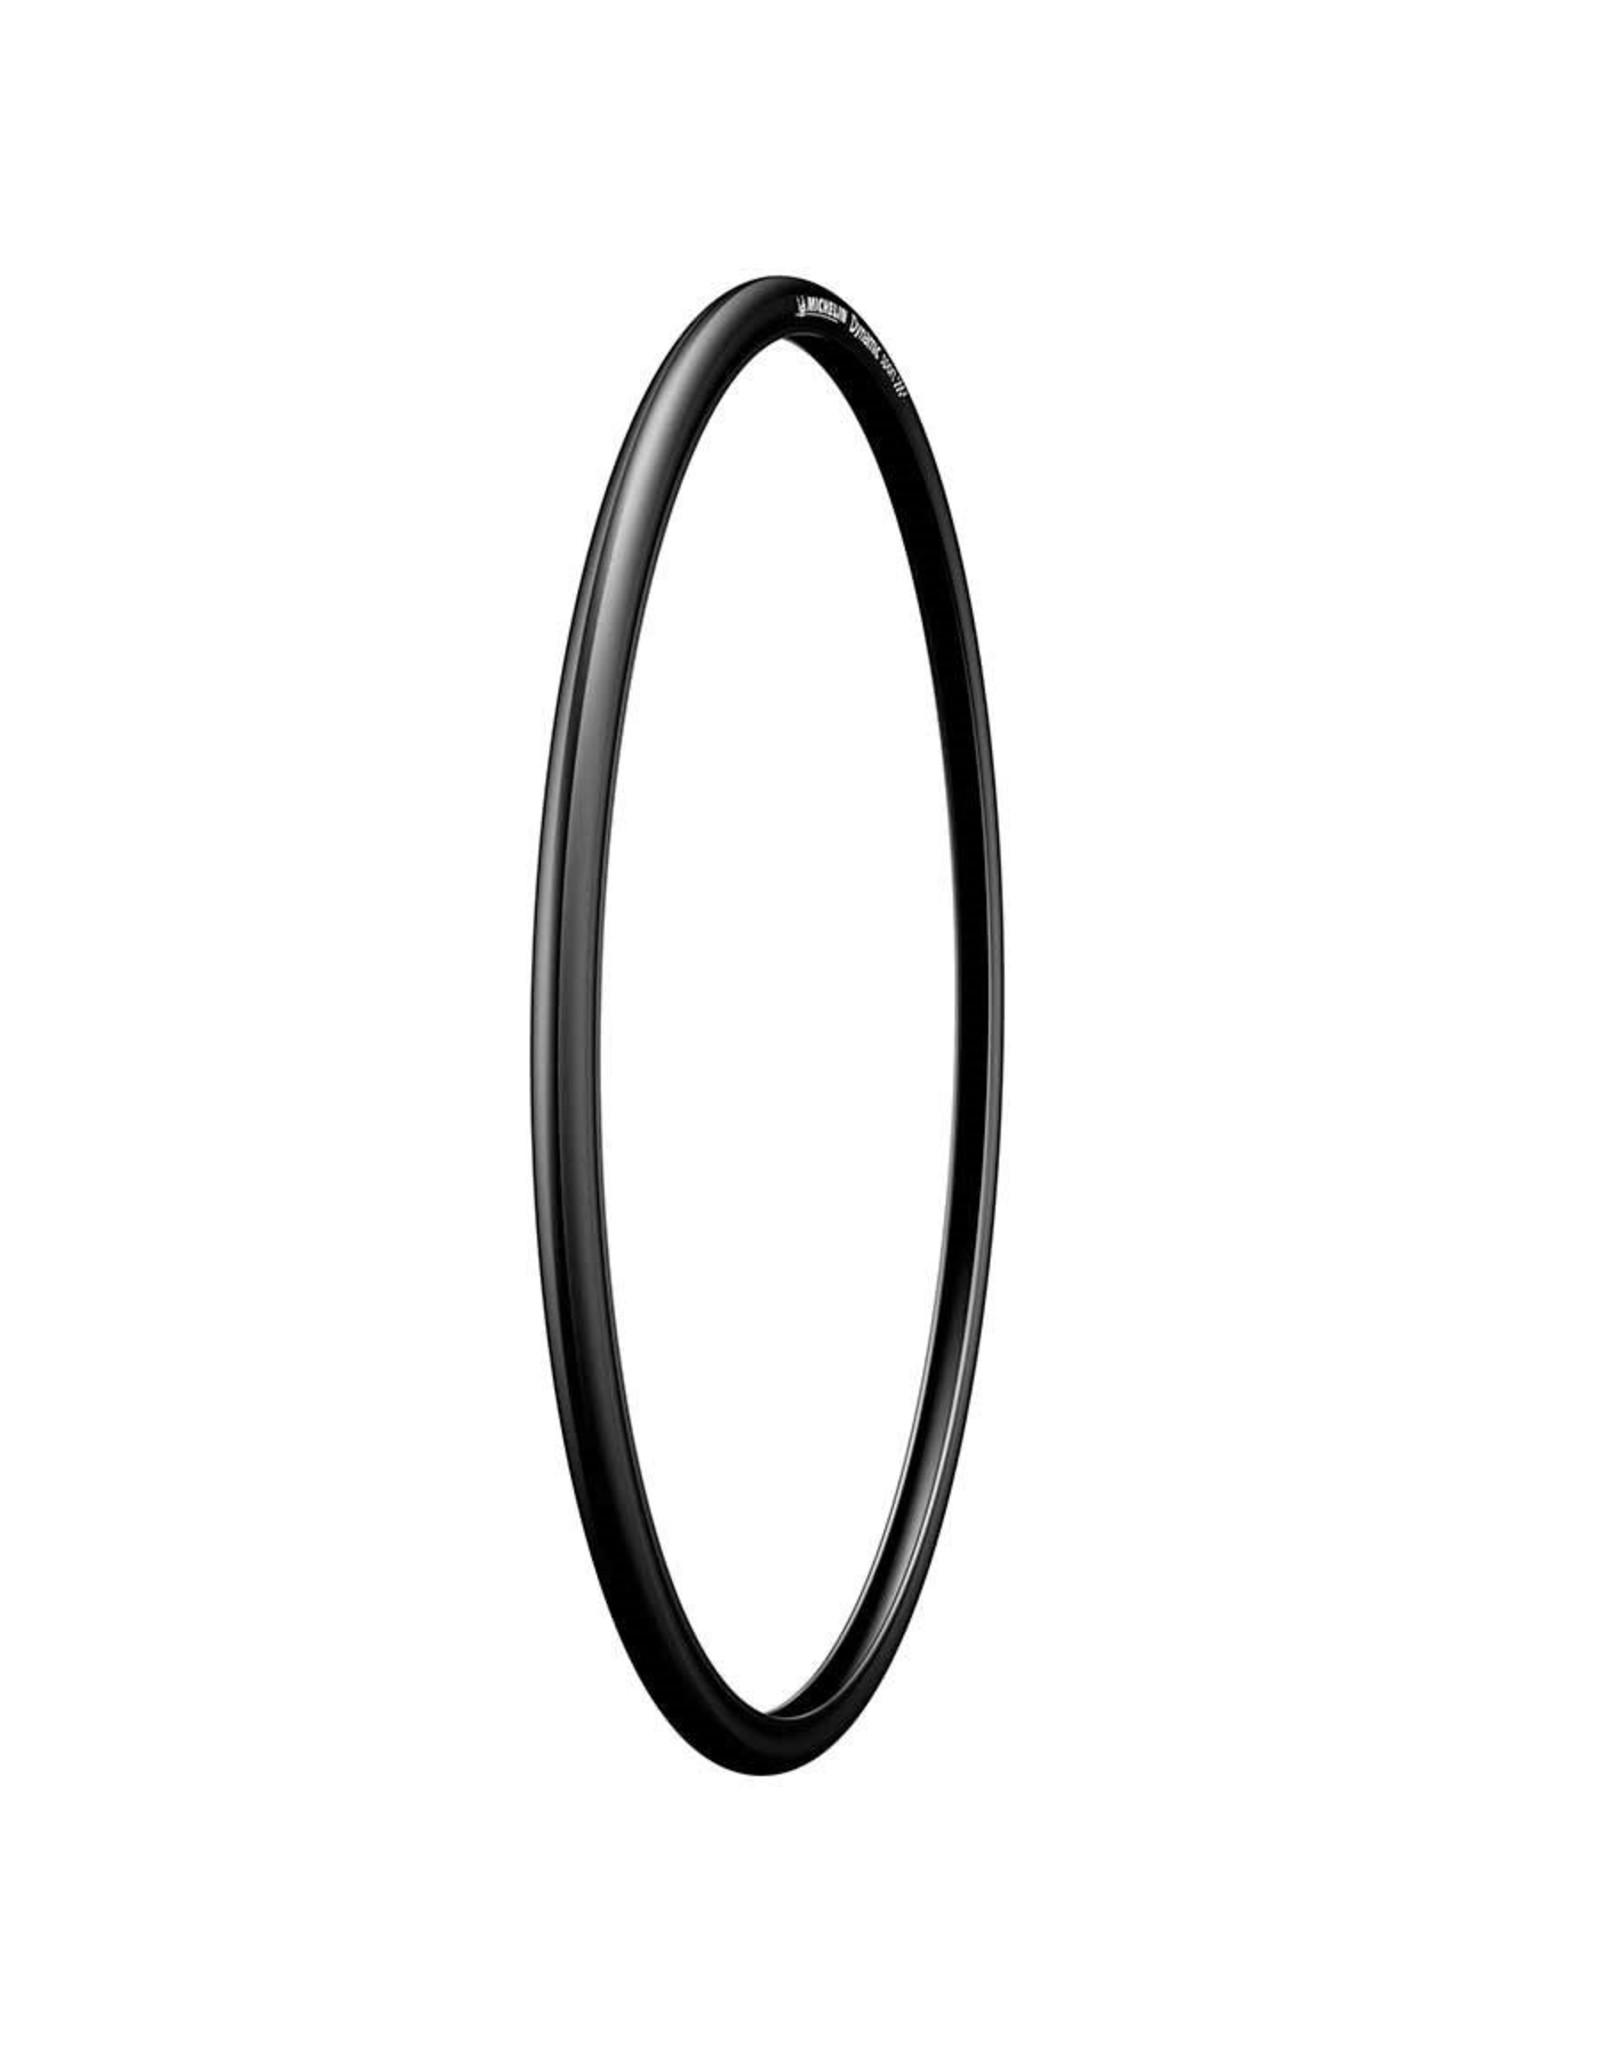 Michelin Michelin, Dynamic Sport, Tire, 700x25C, Folding, Clincher, Single, 30TPI, Black